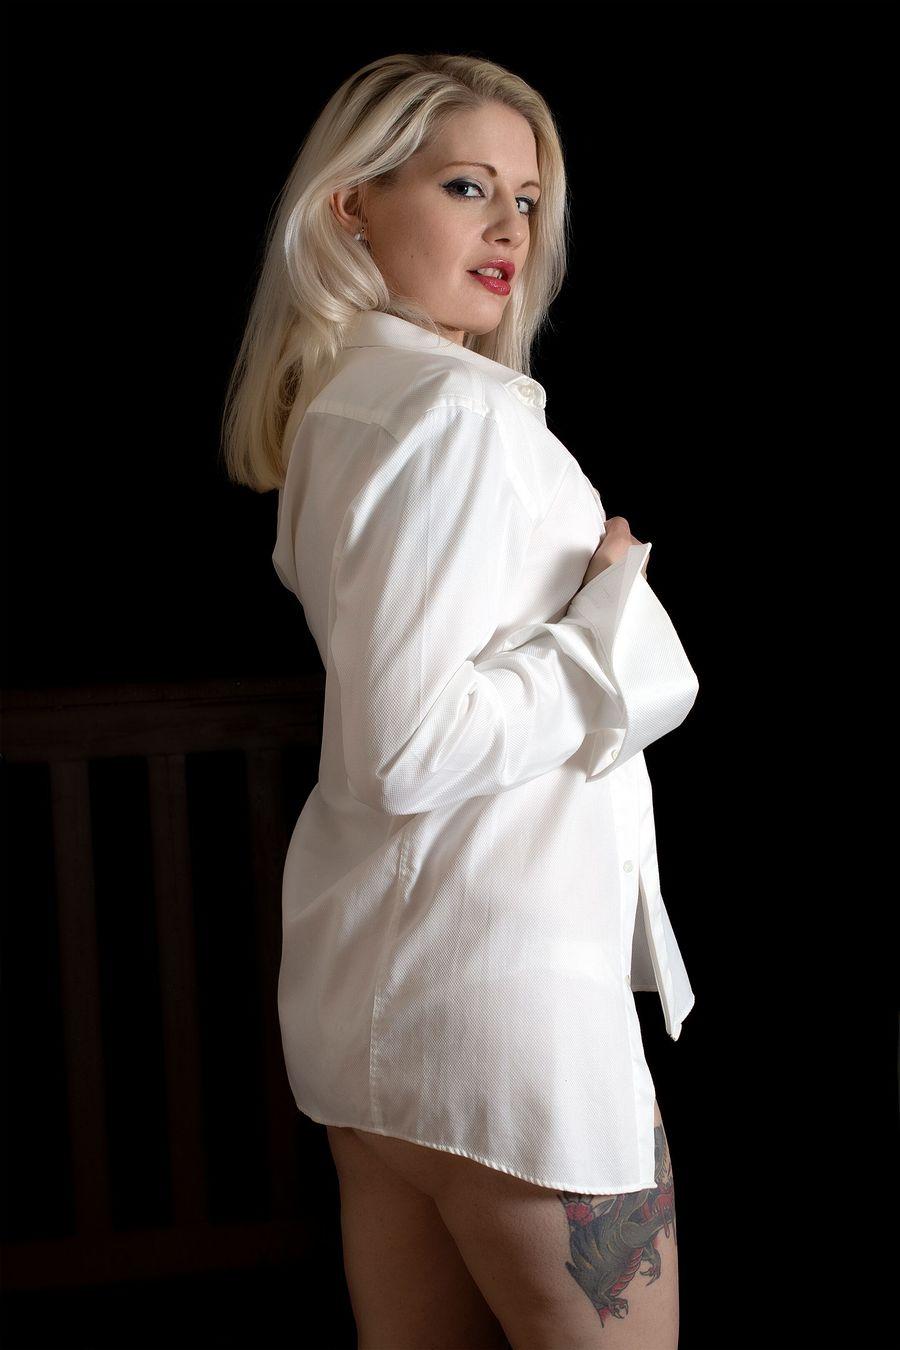 Stayin Over.... / Photography by StarskPhoto, Model Melanie Bond (Butler), Makeup by Melanie Bond (Butler), Post processing by StarskPhoto, Stylist Melanie Bond (Butler), Hair styling by Melanie Bond (Butler) / Uploaded 14th December 2019 @ 06:36 PM